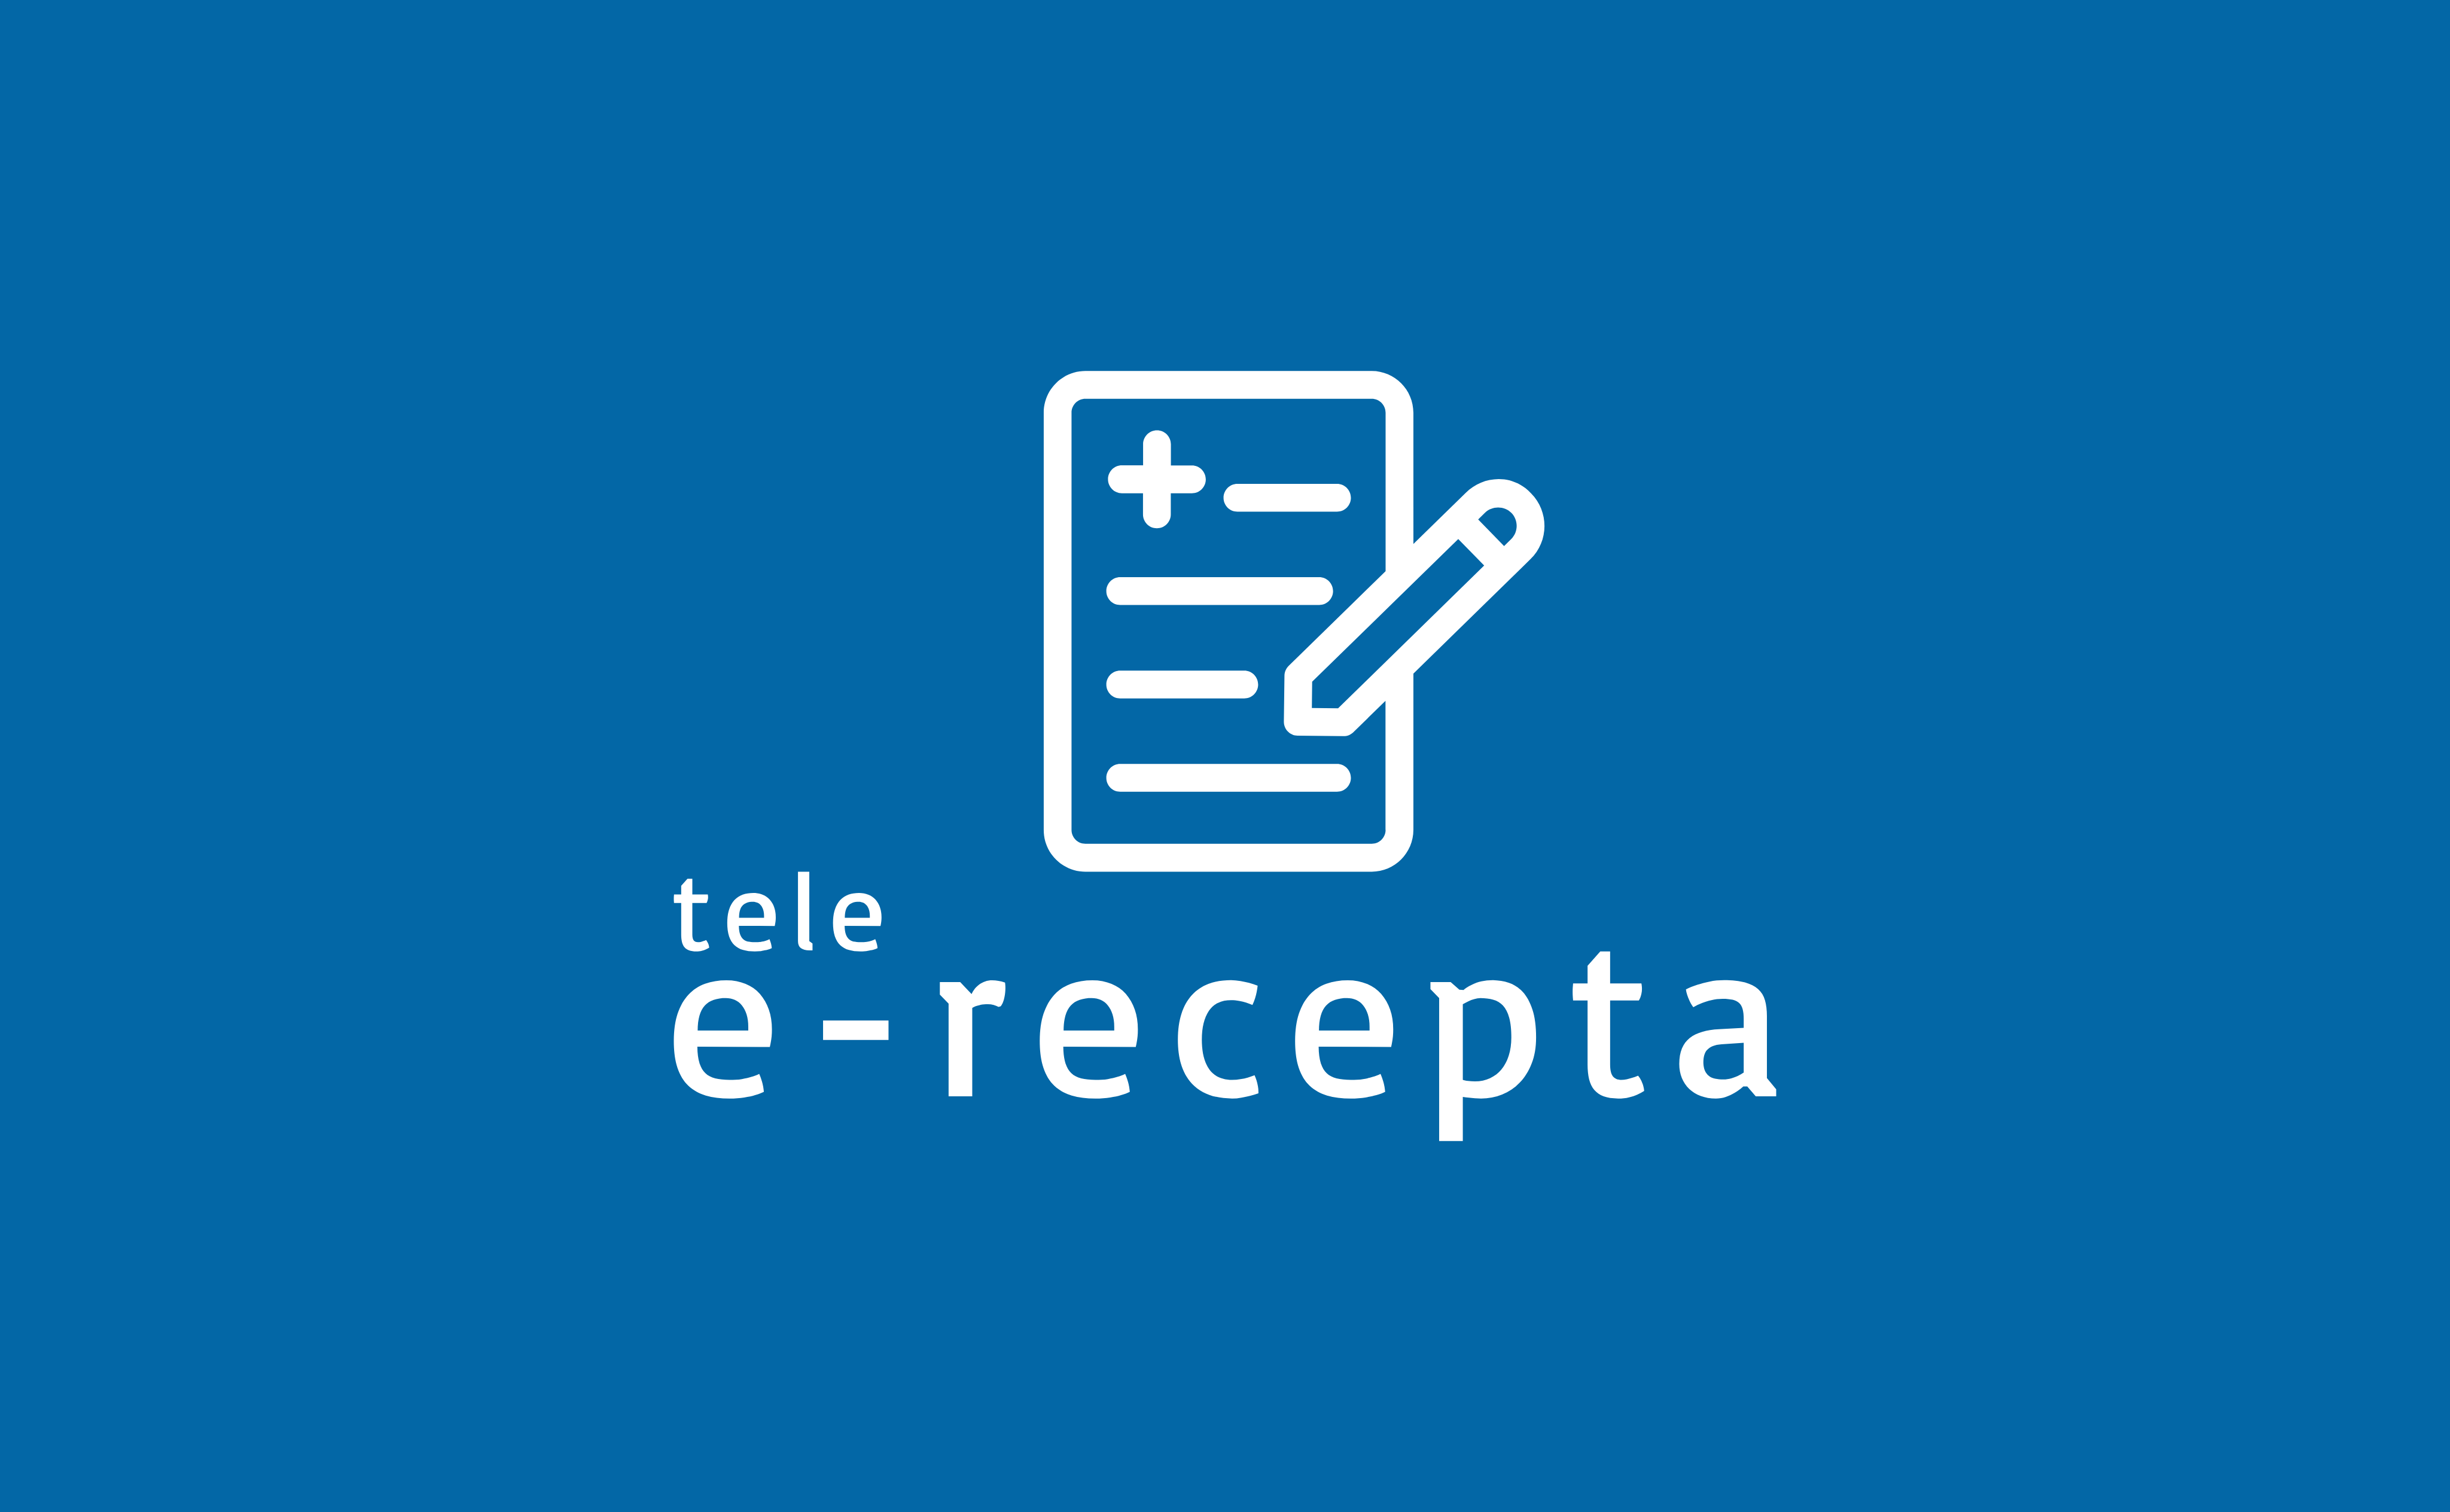 E - recepta